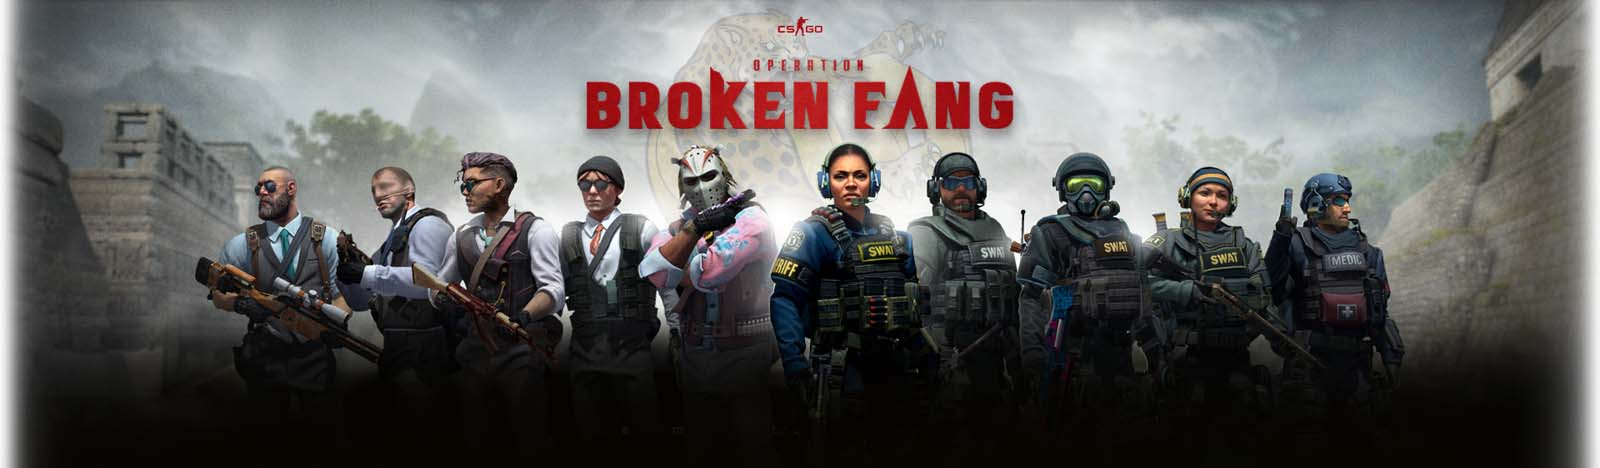 Counter-Strike Global Offensive - Operation Broken Fang